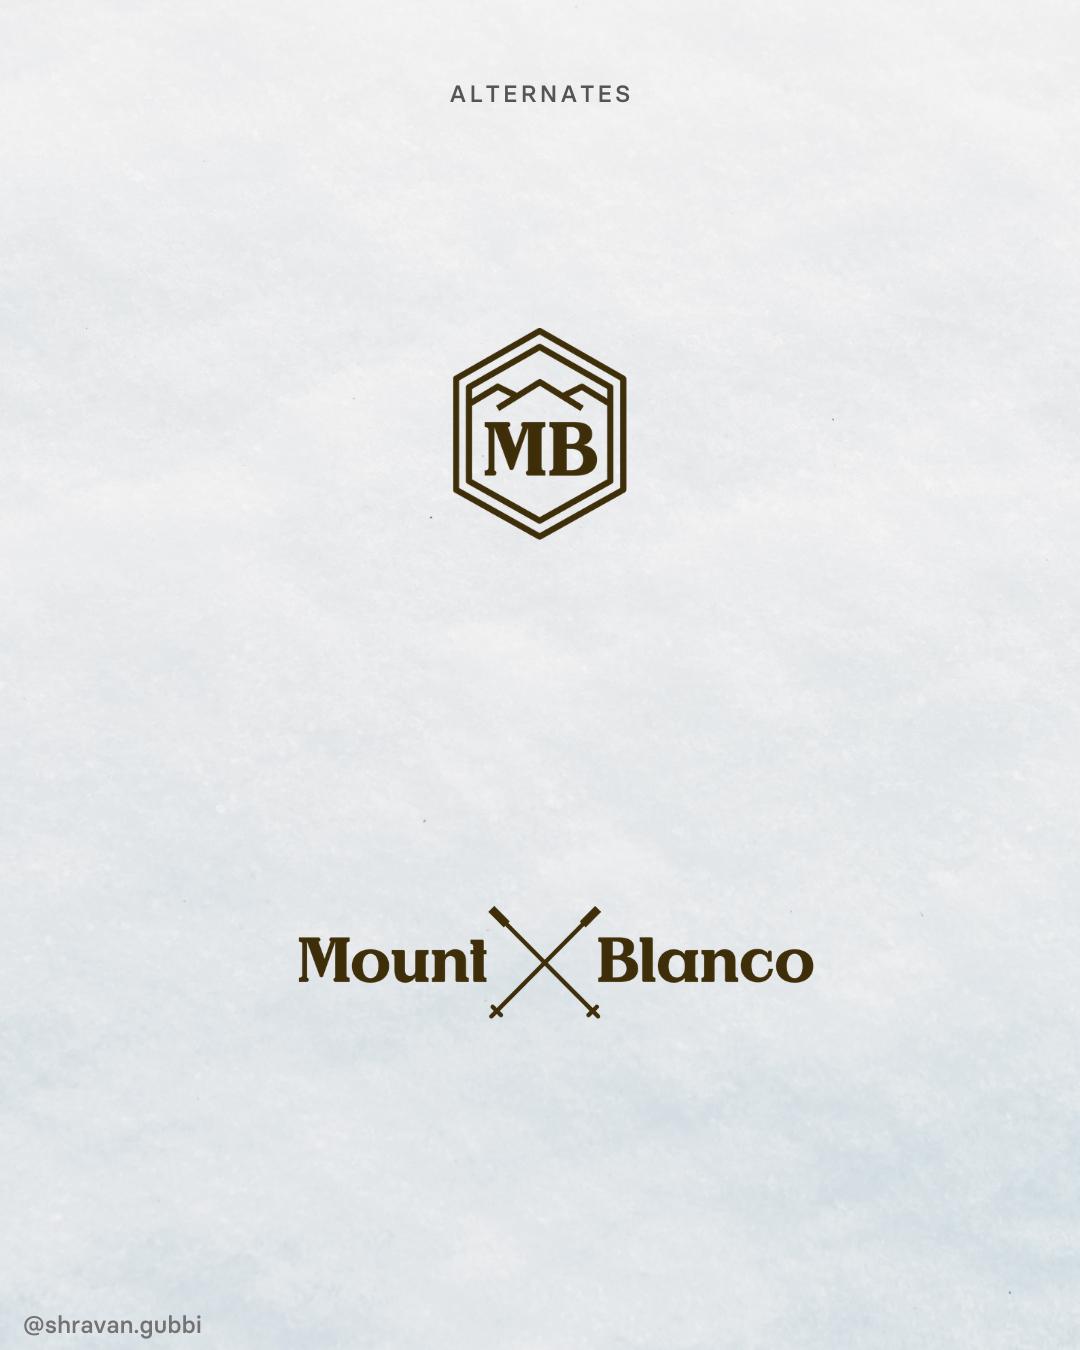 Shravan_gubbi_Mount_Blanco_logo_4